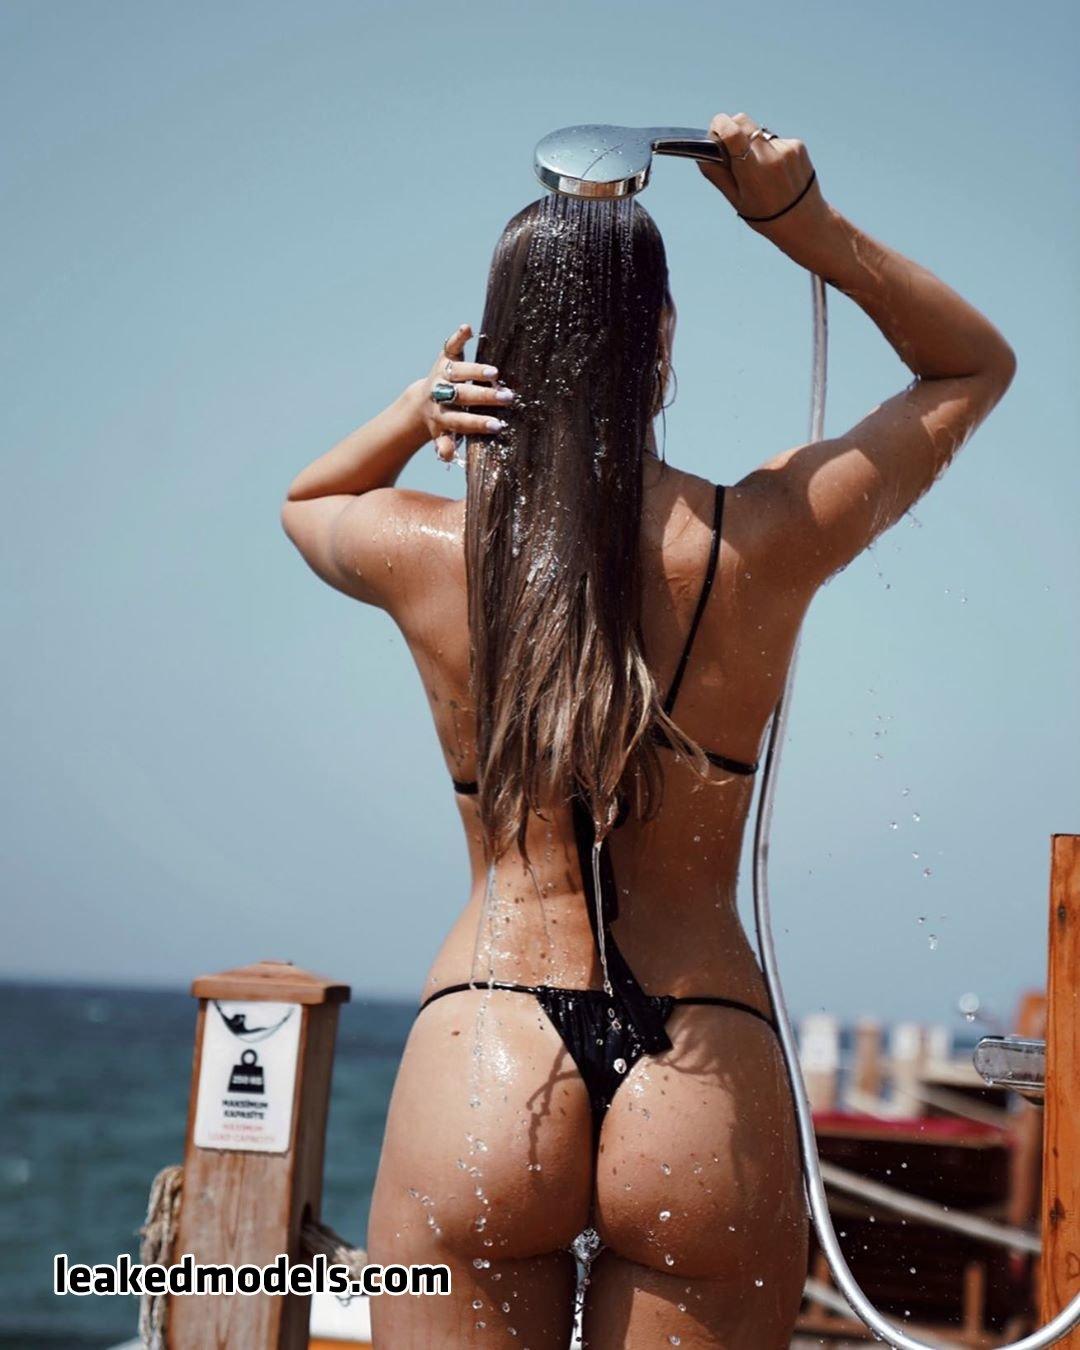 Shir Gartenberg Instagram Sexy Leaks (25 Photos)